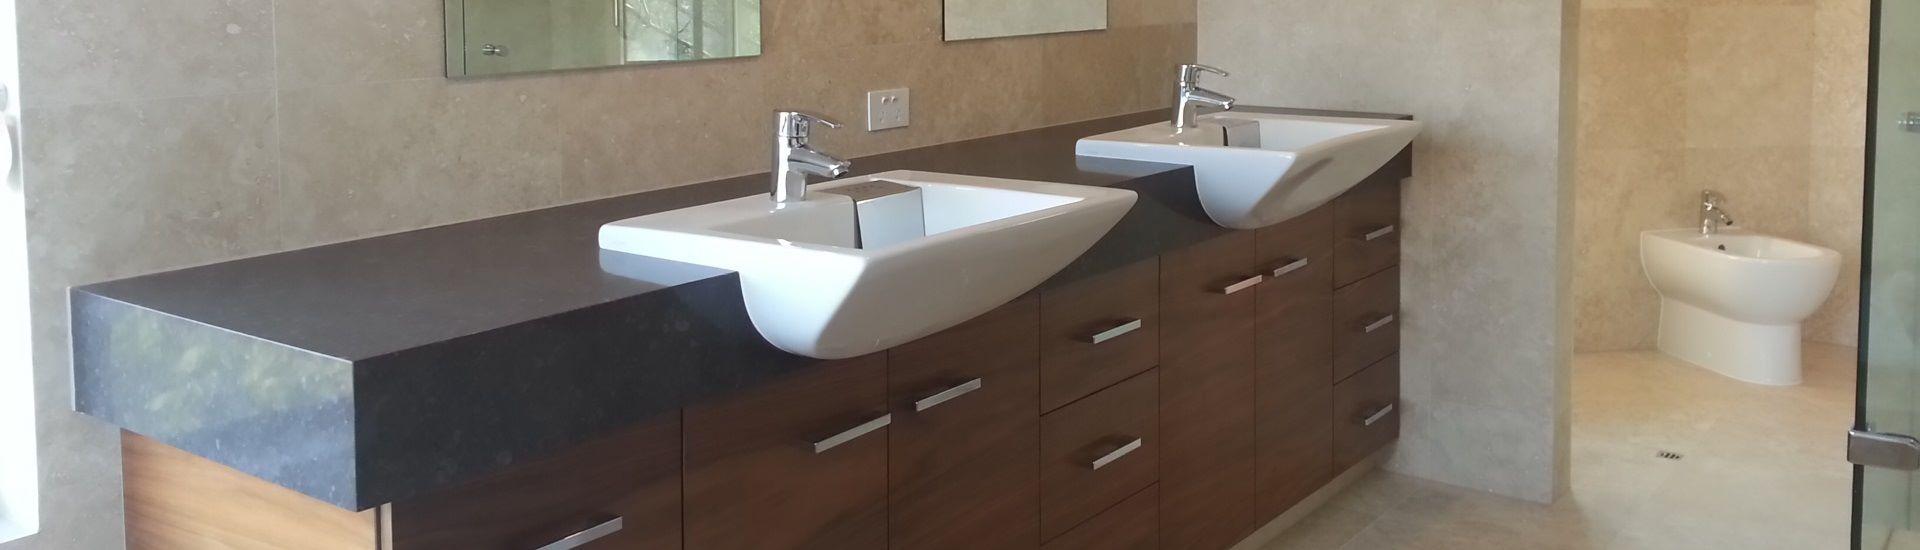 Bathroom Makeover Perth kitchen solutions - bathroom & kitchen renovations perth wa